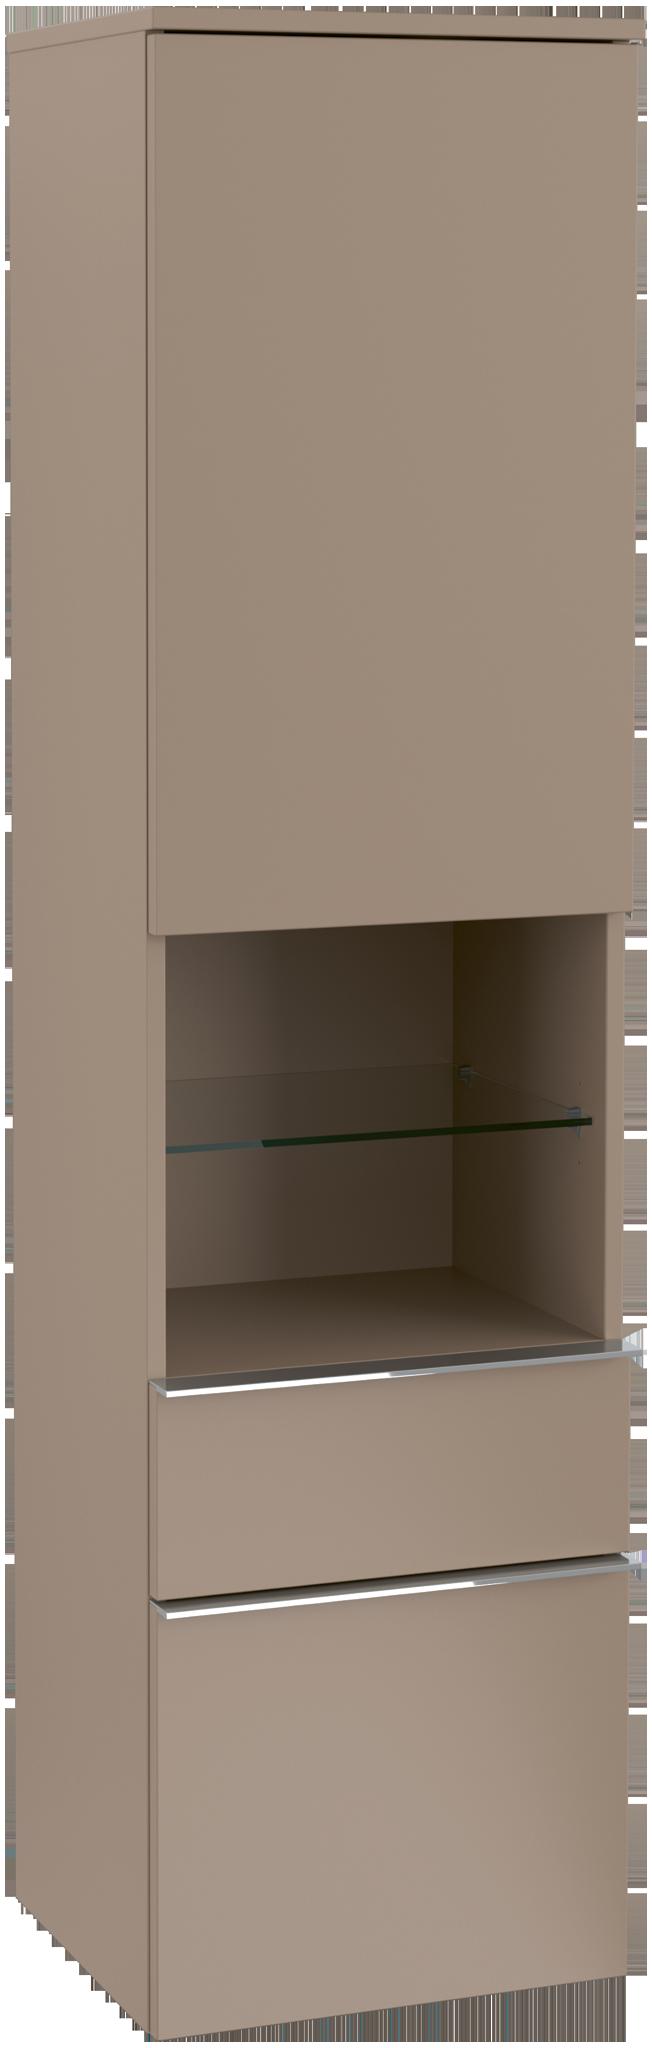 venticello hochschrank a95203 villeroy boch. Black Bedroom Furniture Sets. Home Design Ideas